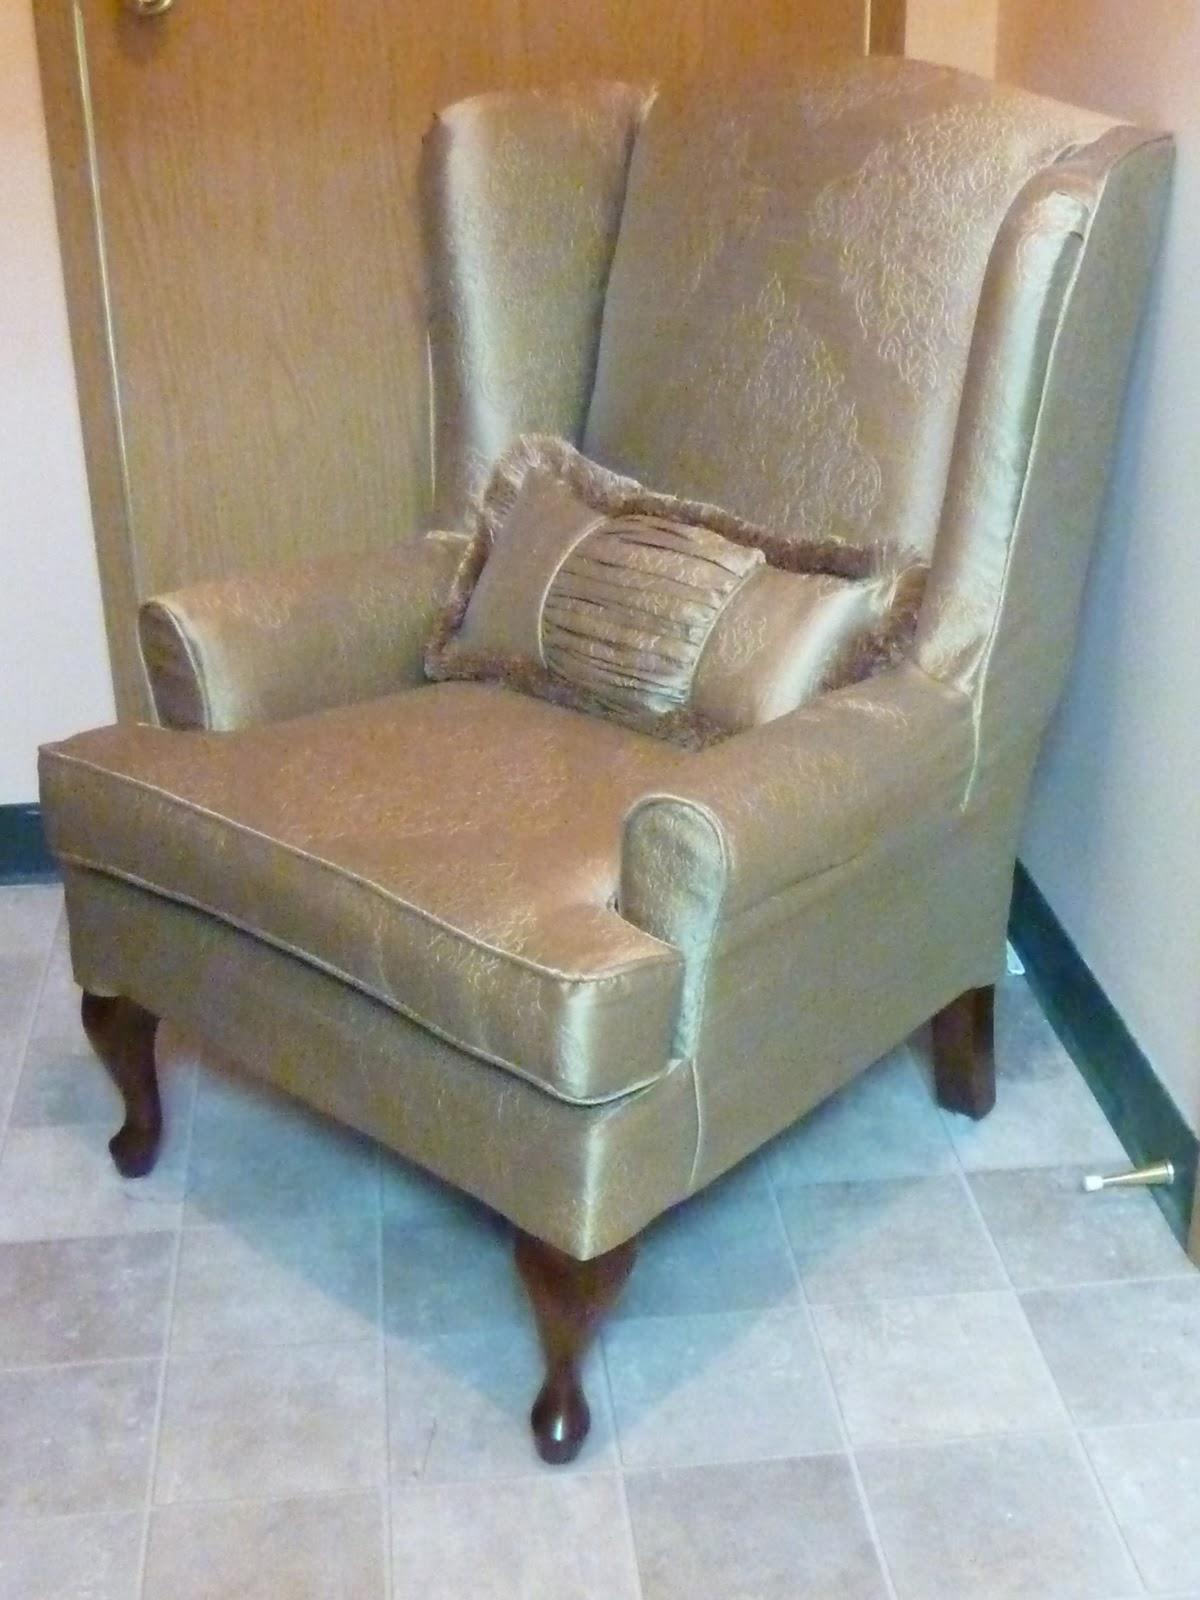 taffeta chair design dilemmas from design sewlutions. Black Bedroom Furniture Sets. Home Design Ideas